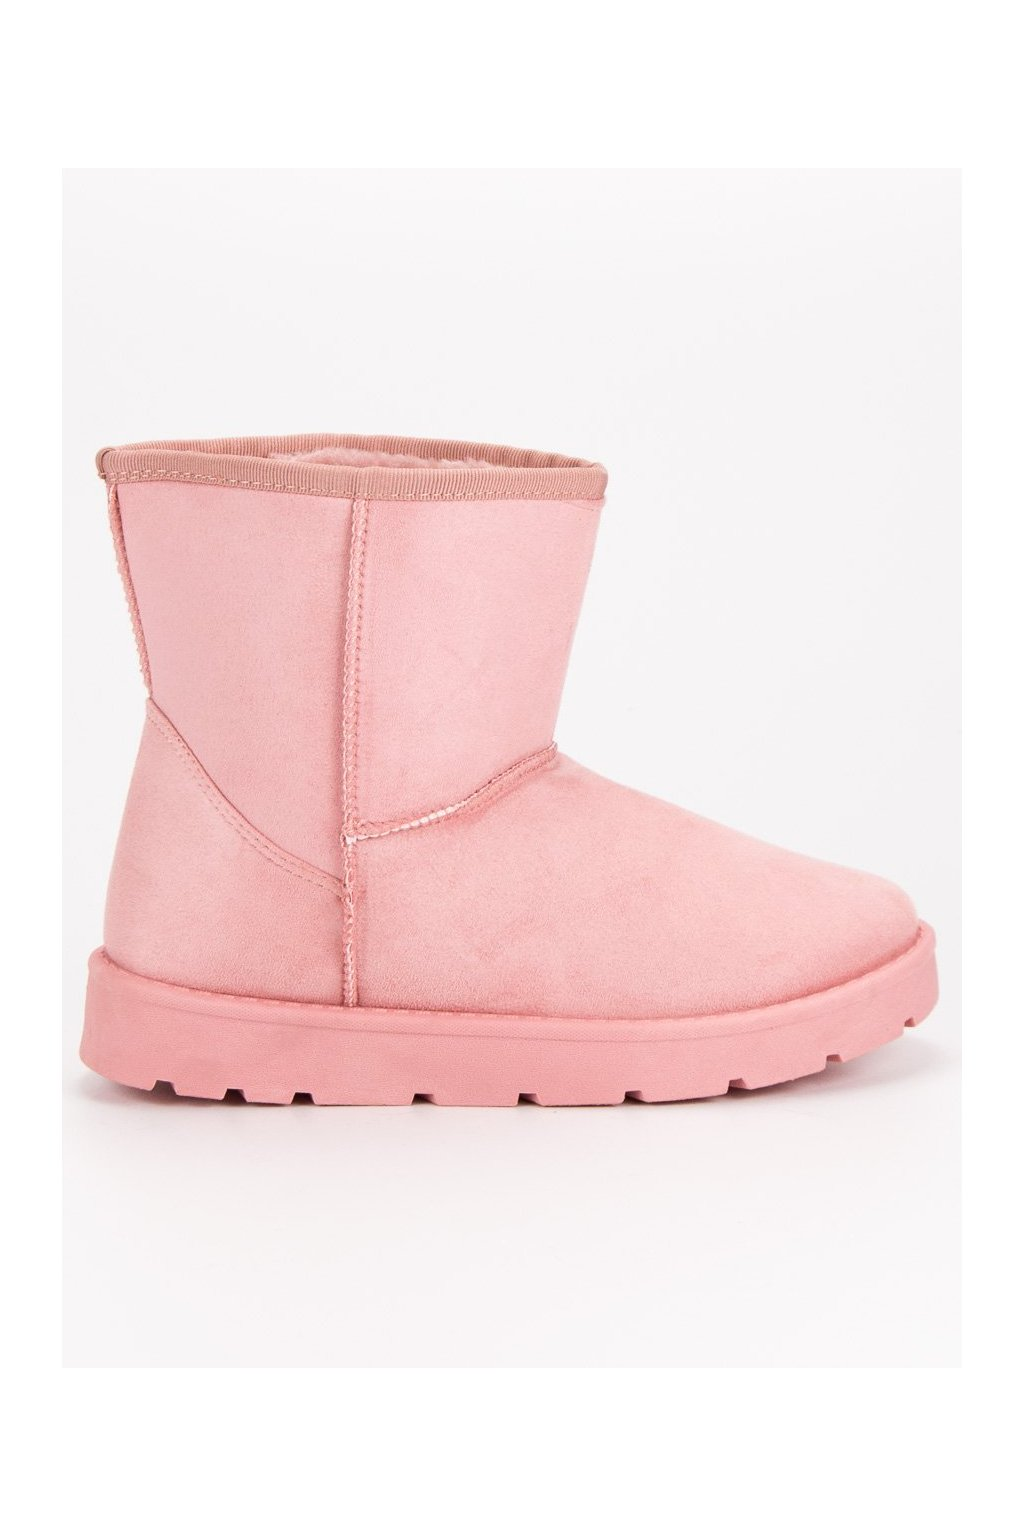 19787a6cb574 Ružové snehule